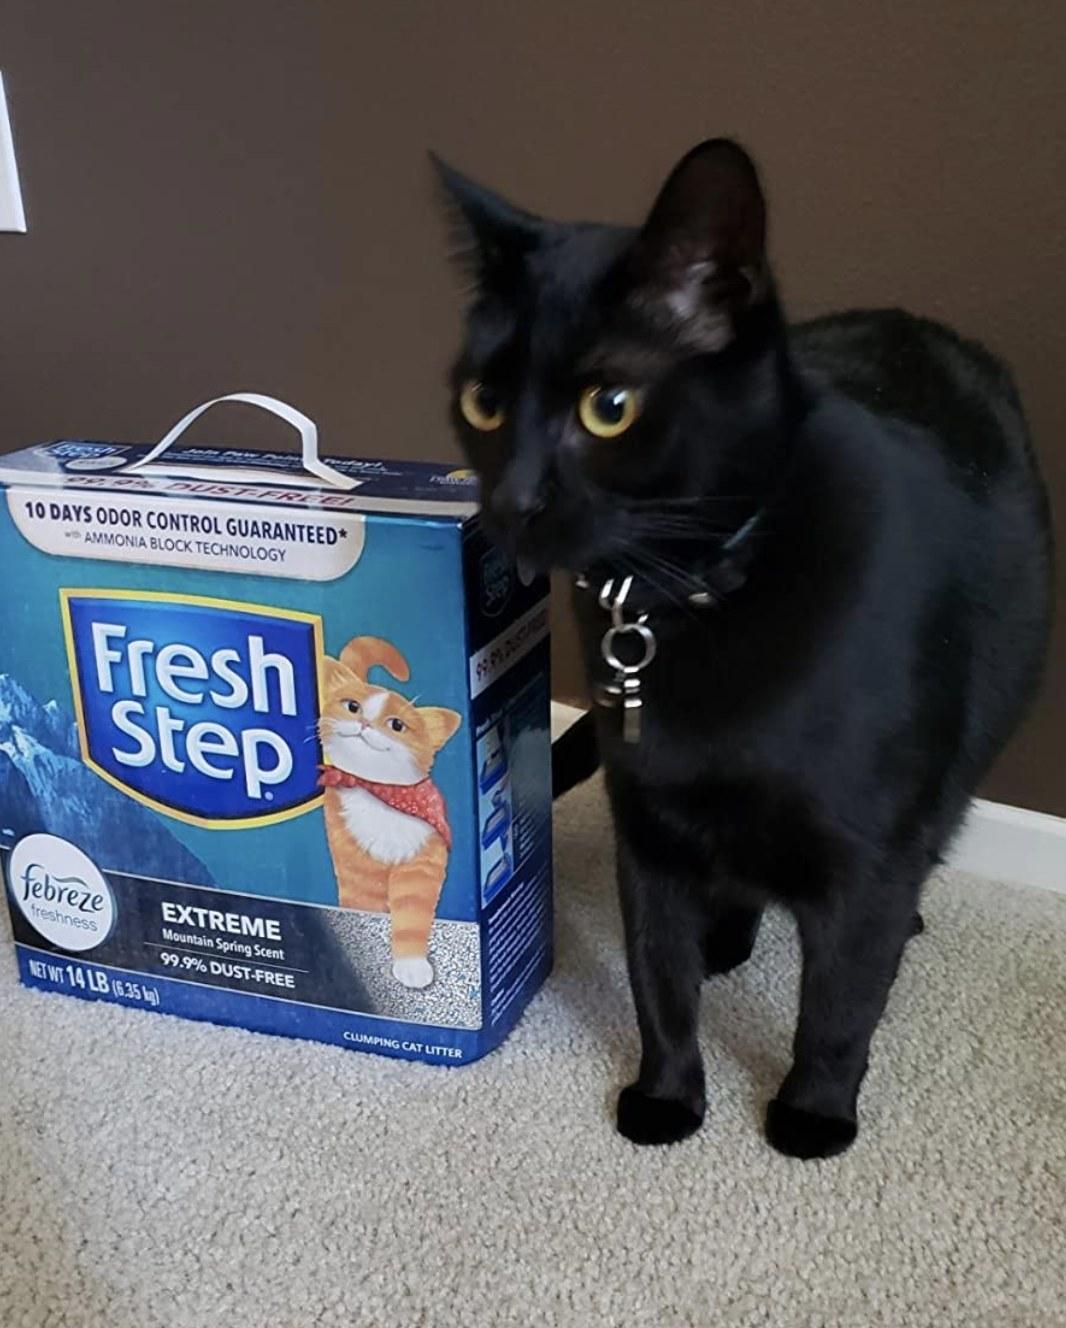 a black cat next to a box of fresh step cat litter